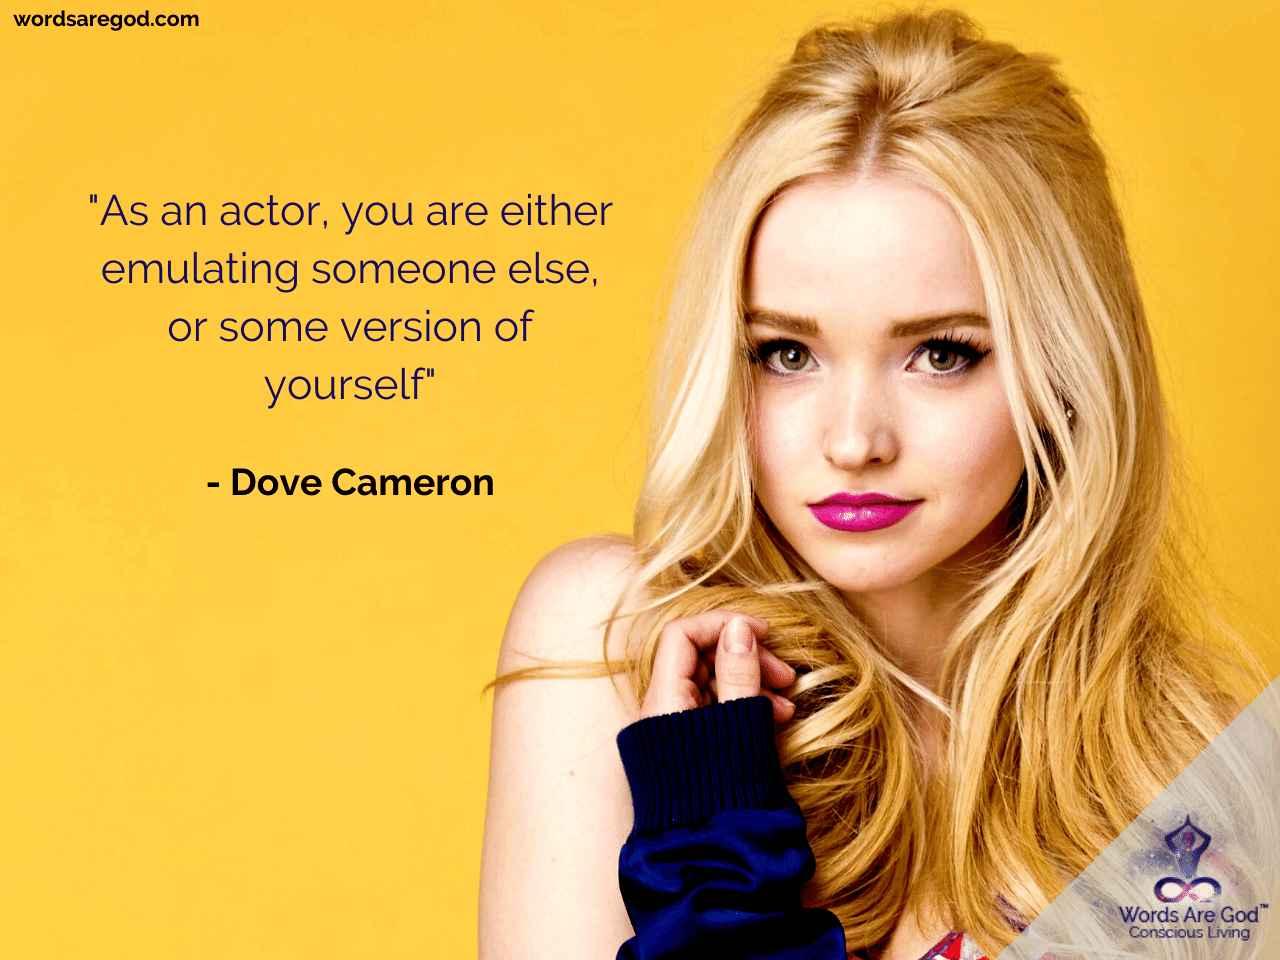 Dove Cameron Inspirational Quote